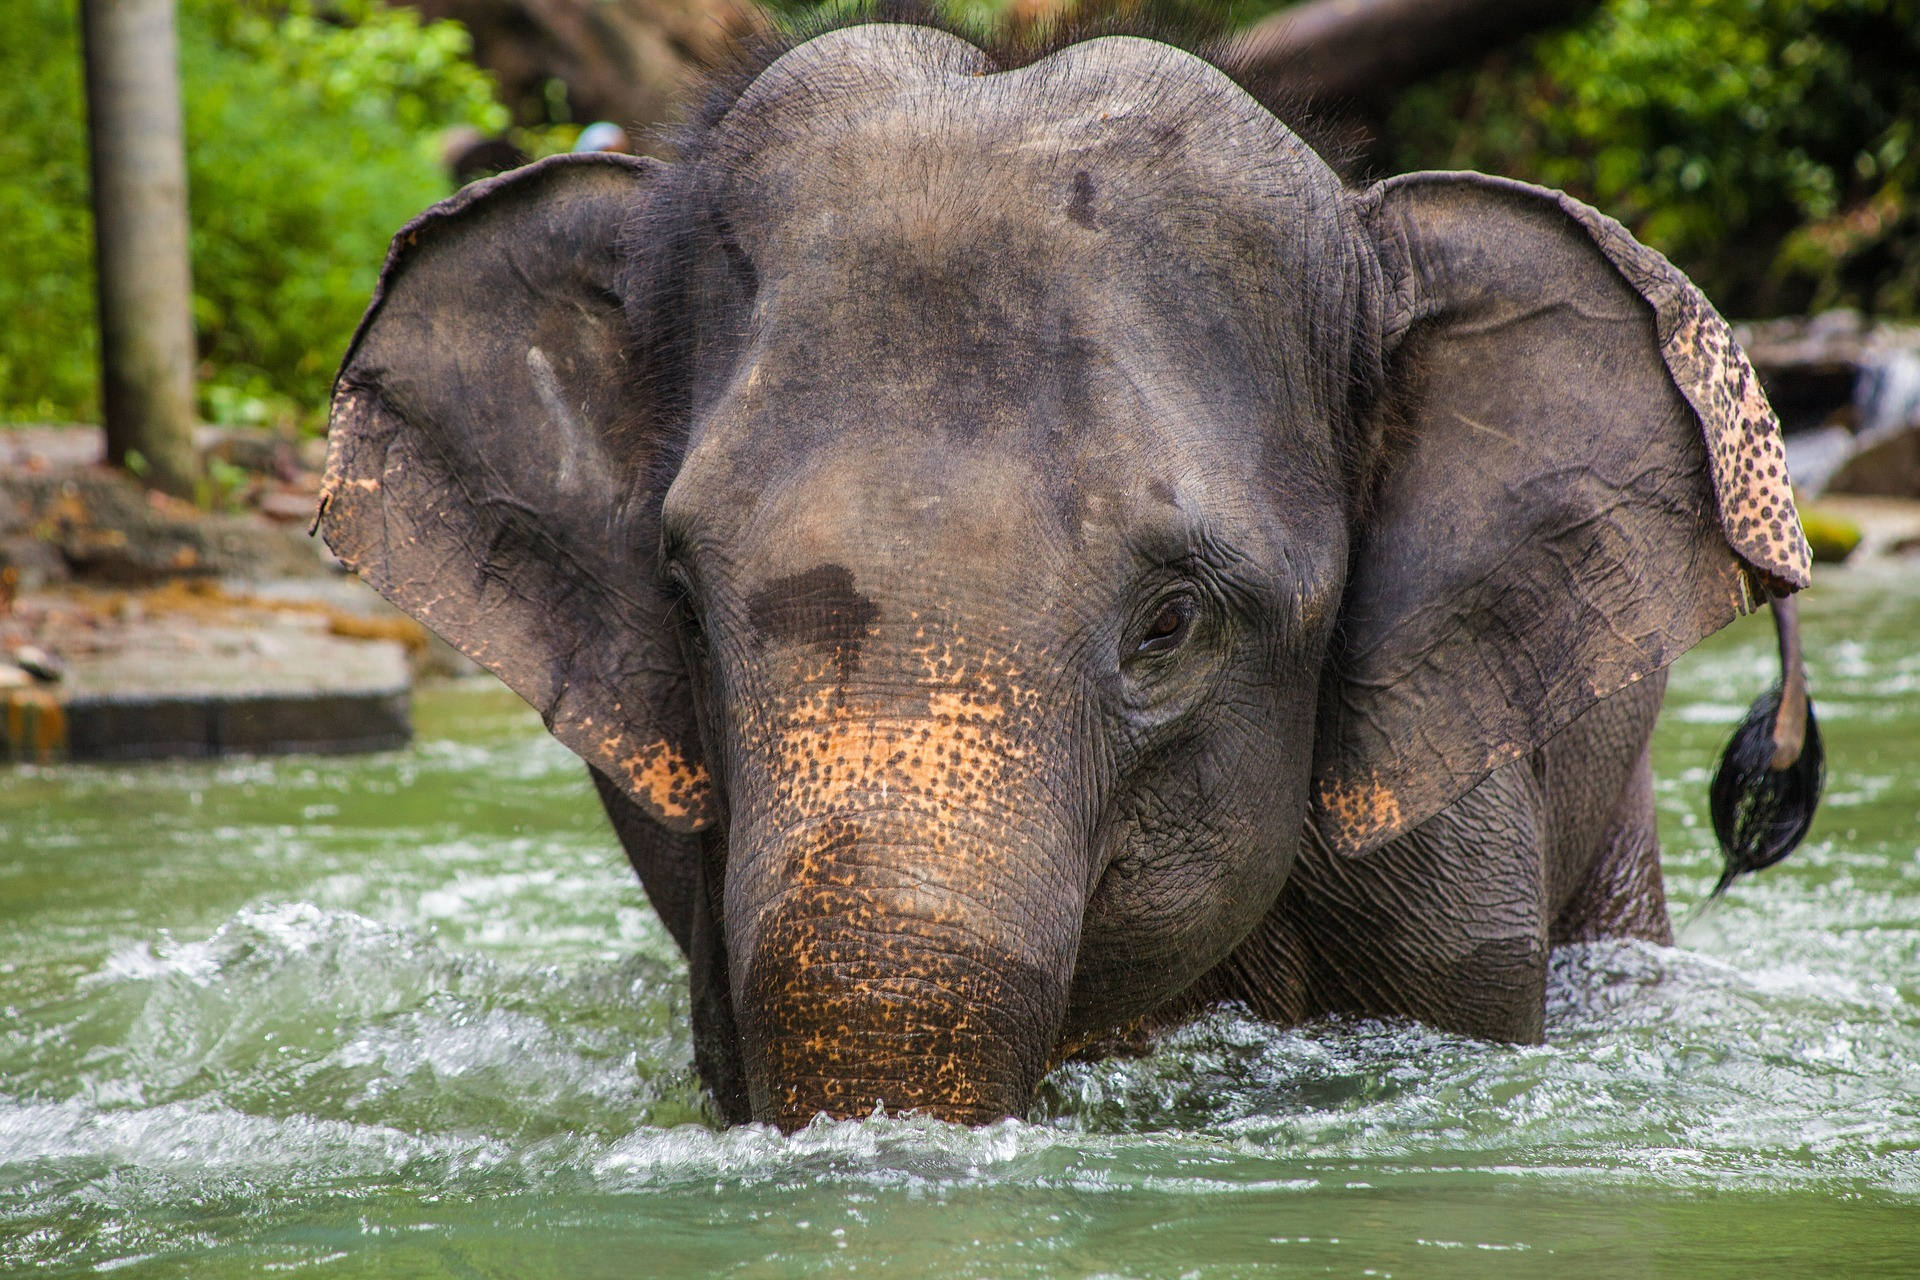 elephant_asie_thailande_bain_maltraitance_animale_touristes